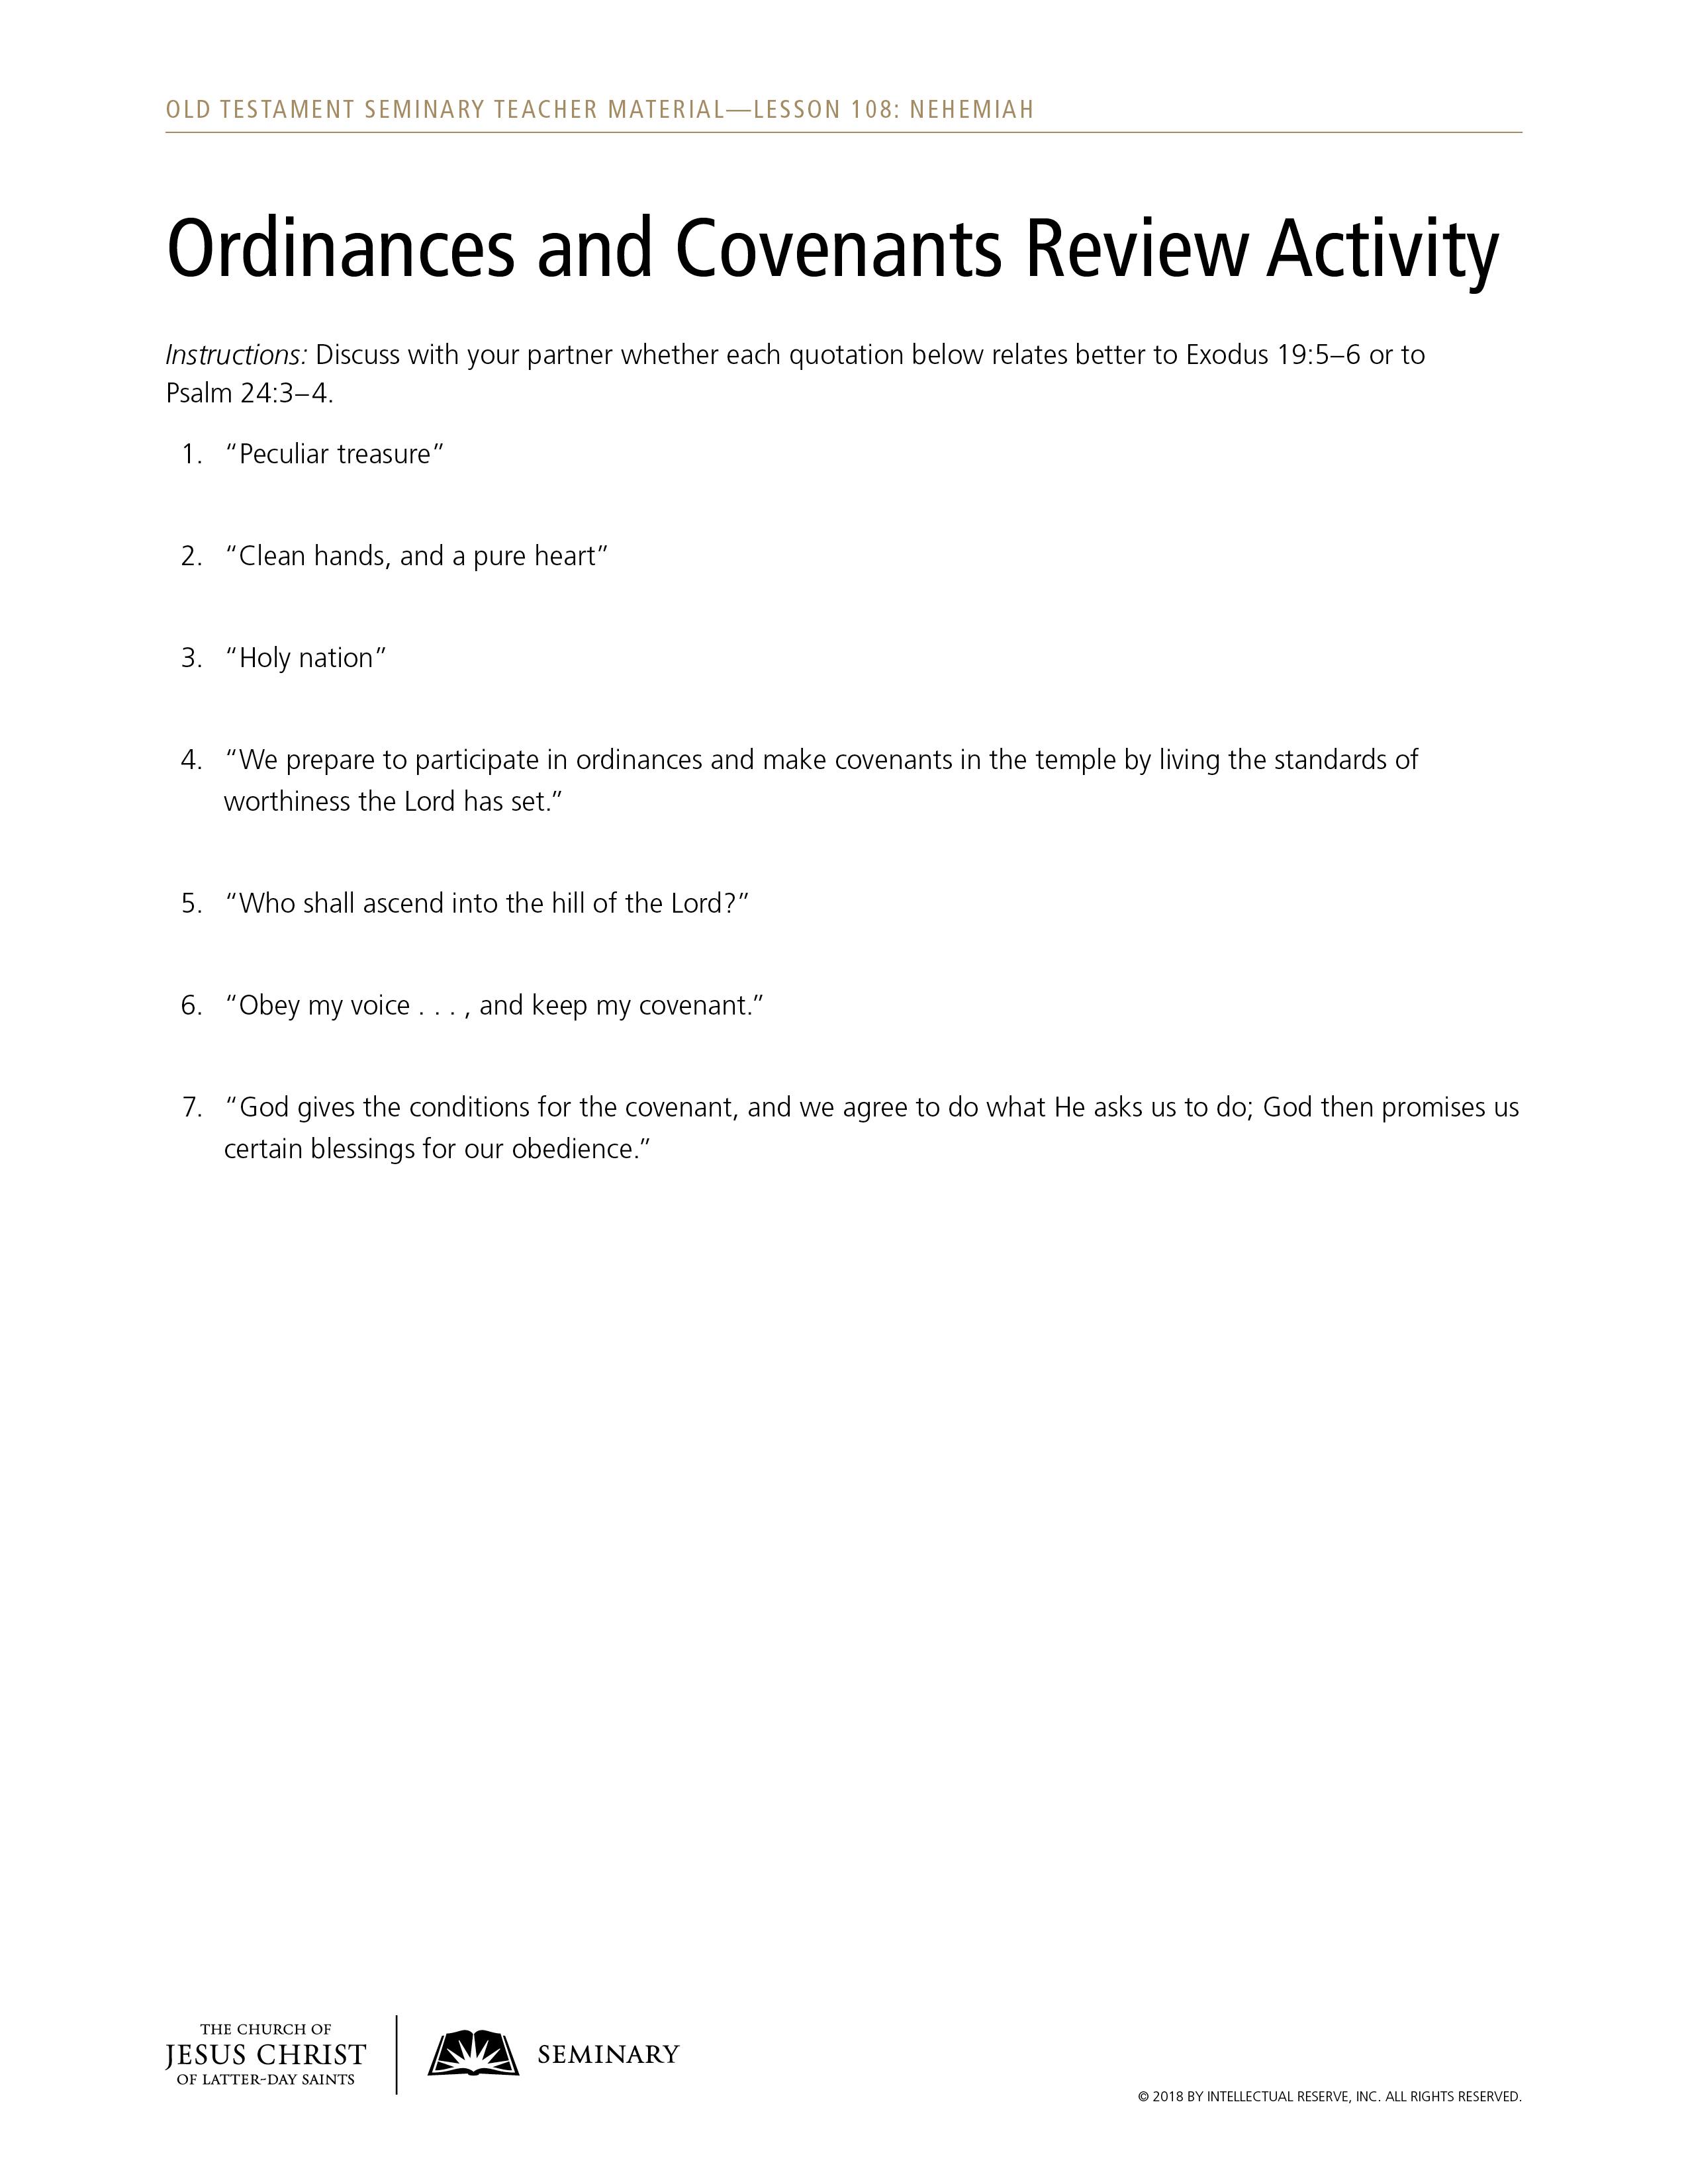 5 old testament covenants